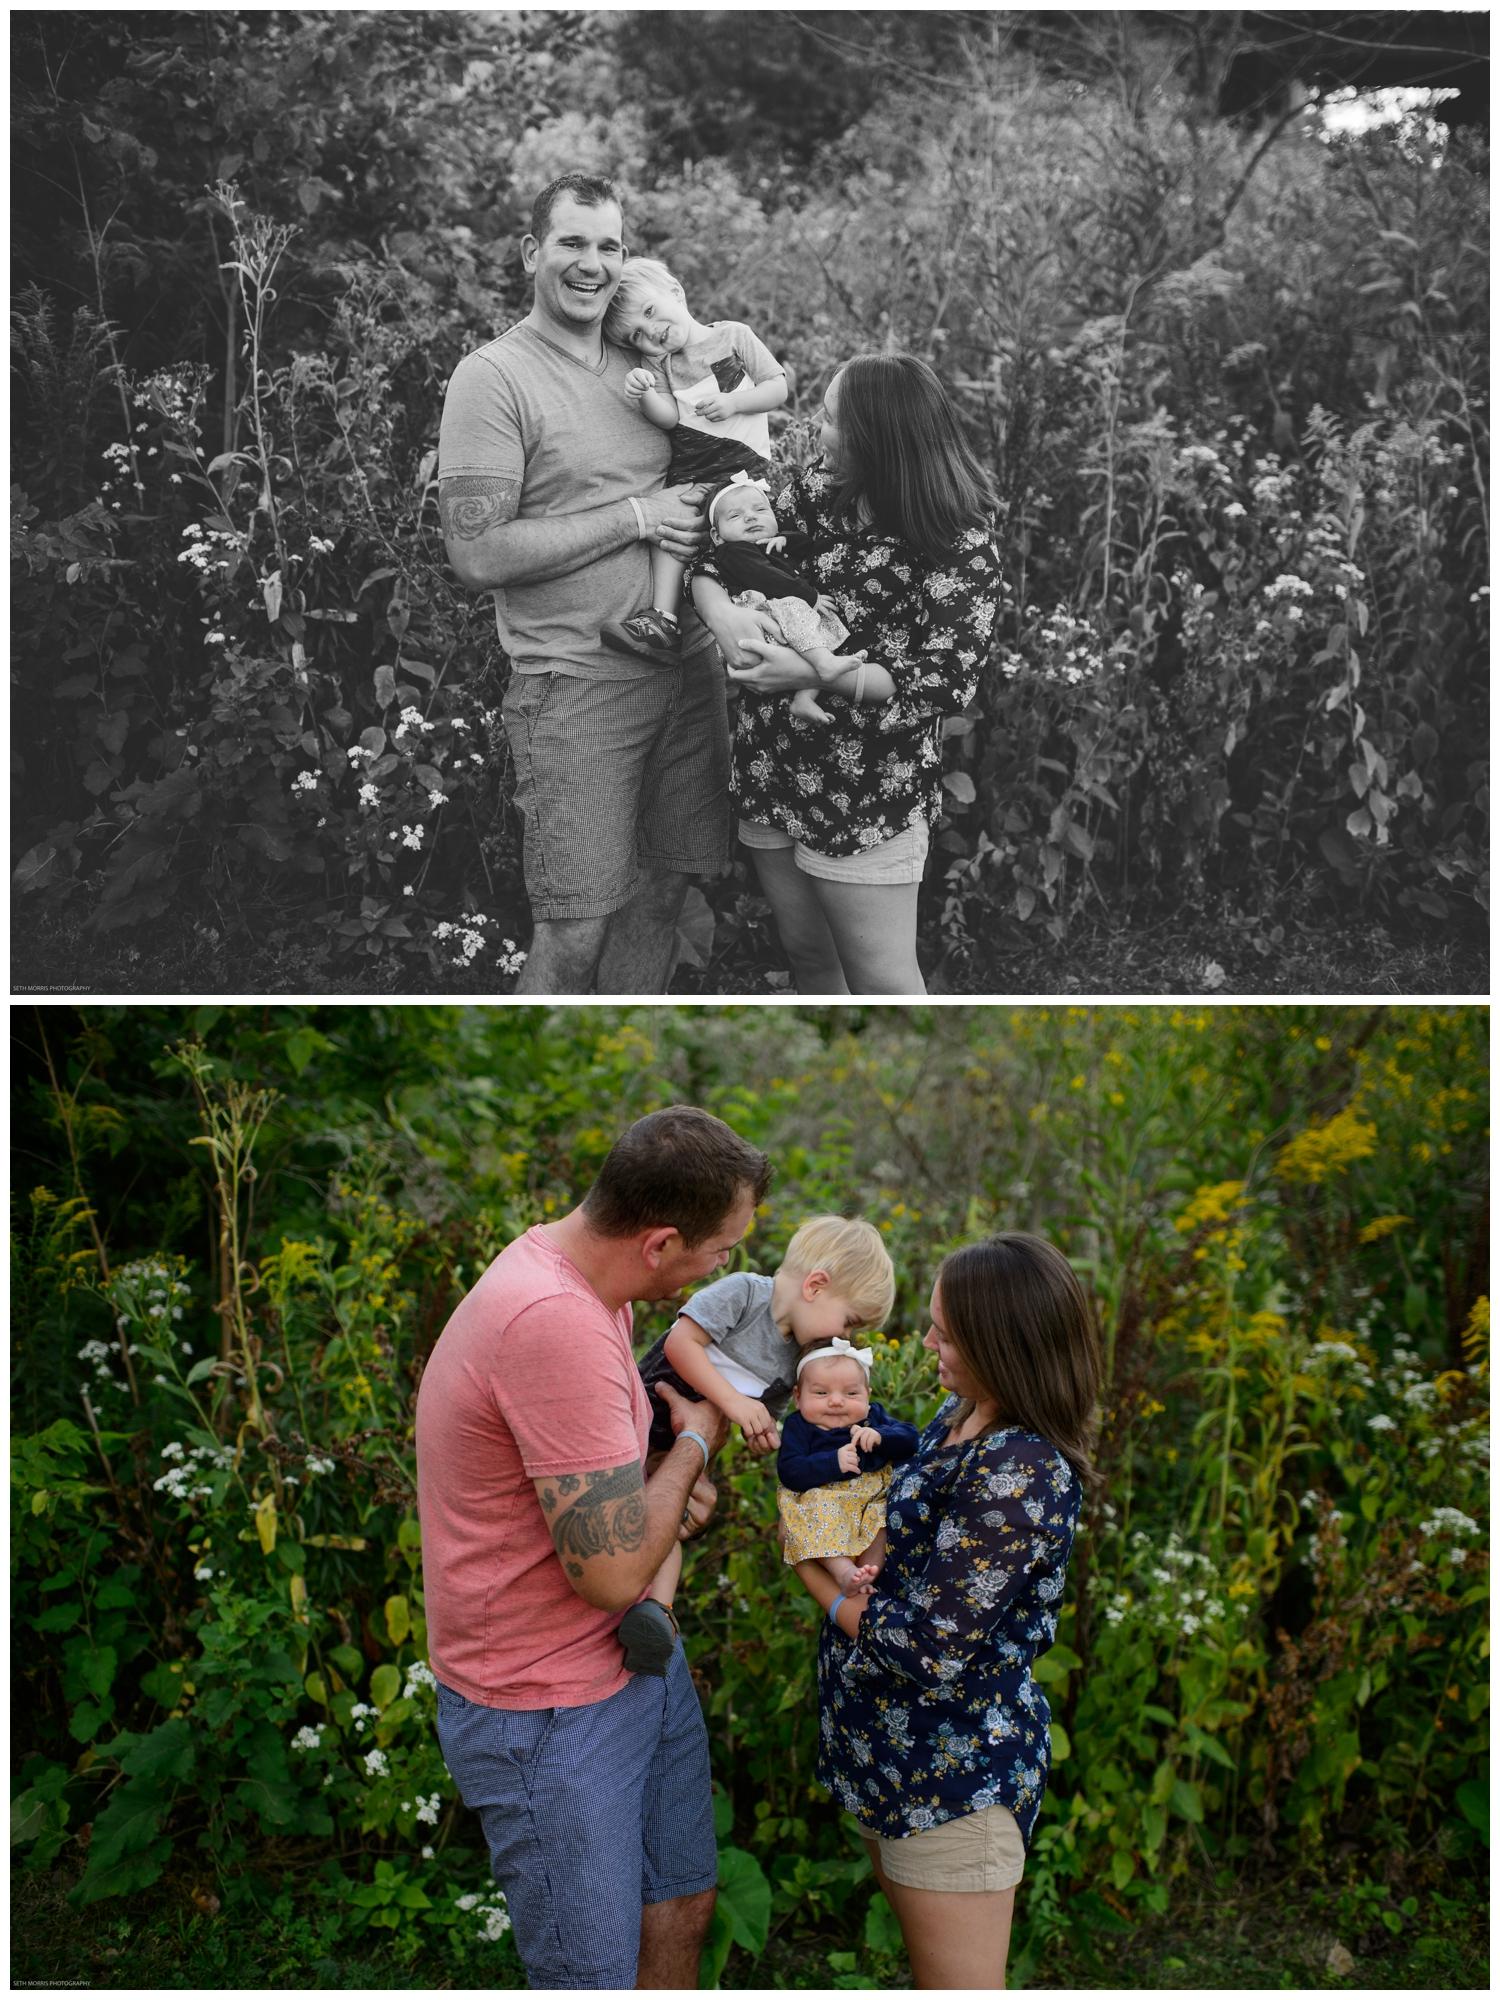 cittafamily-26.jpg